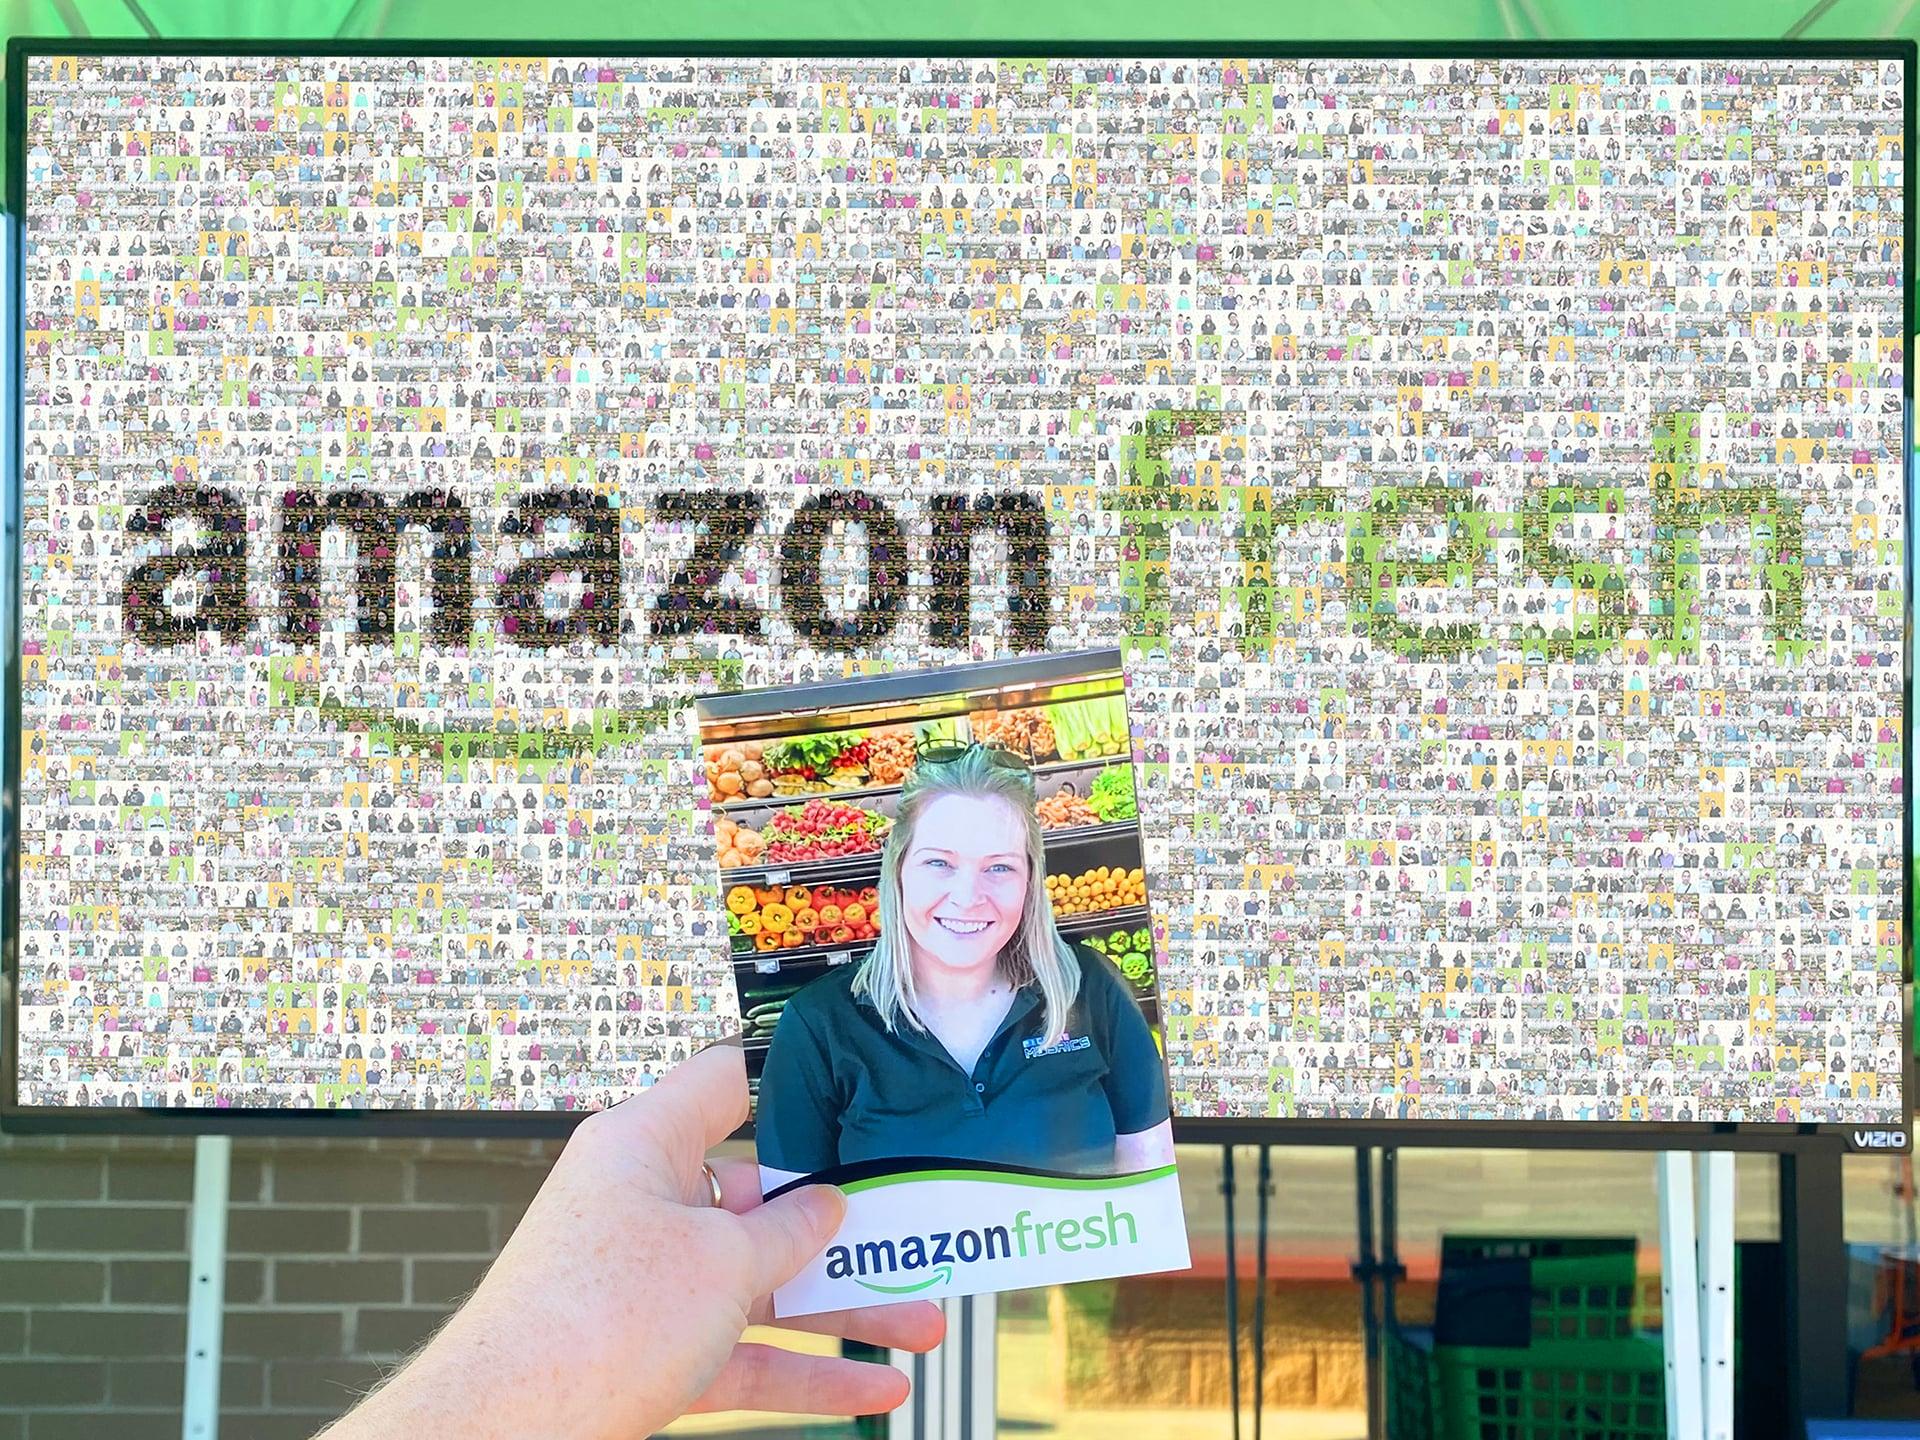 Live Digital Mosaic: Amazon Fresh